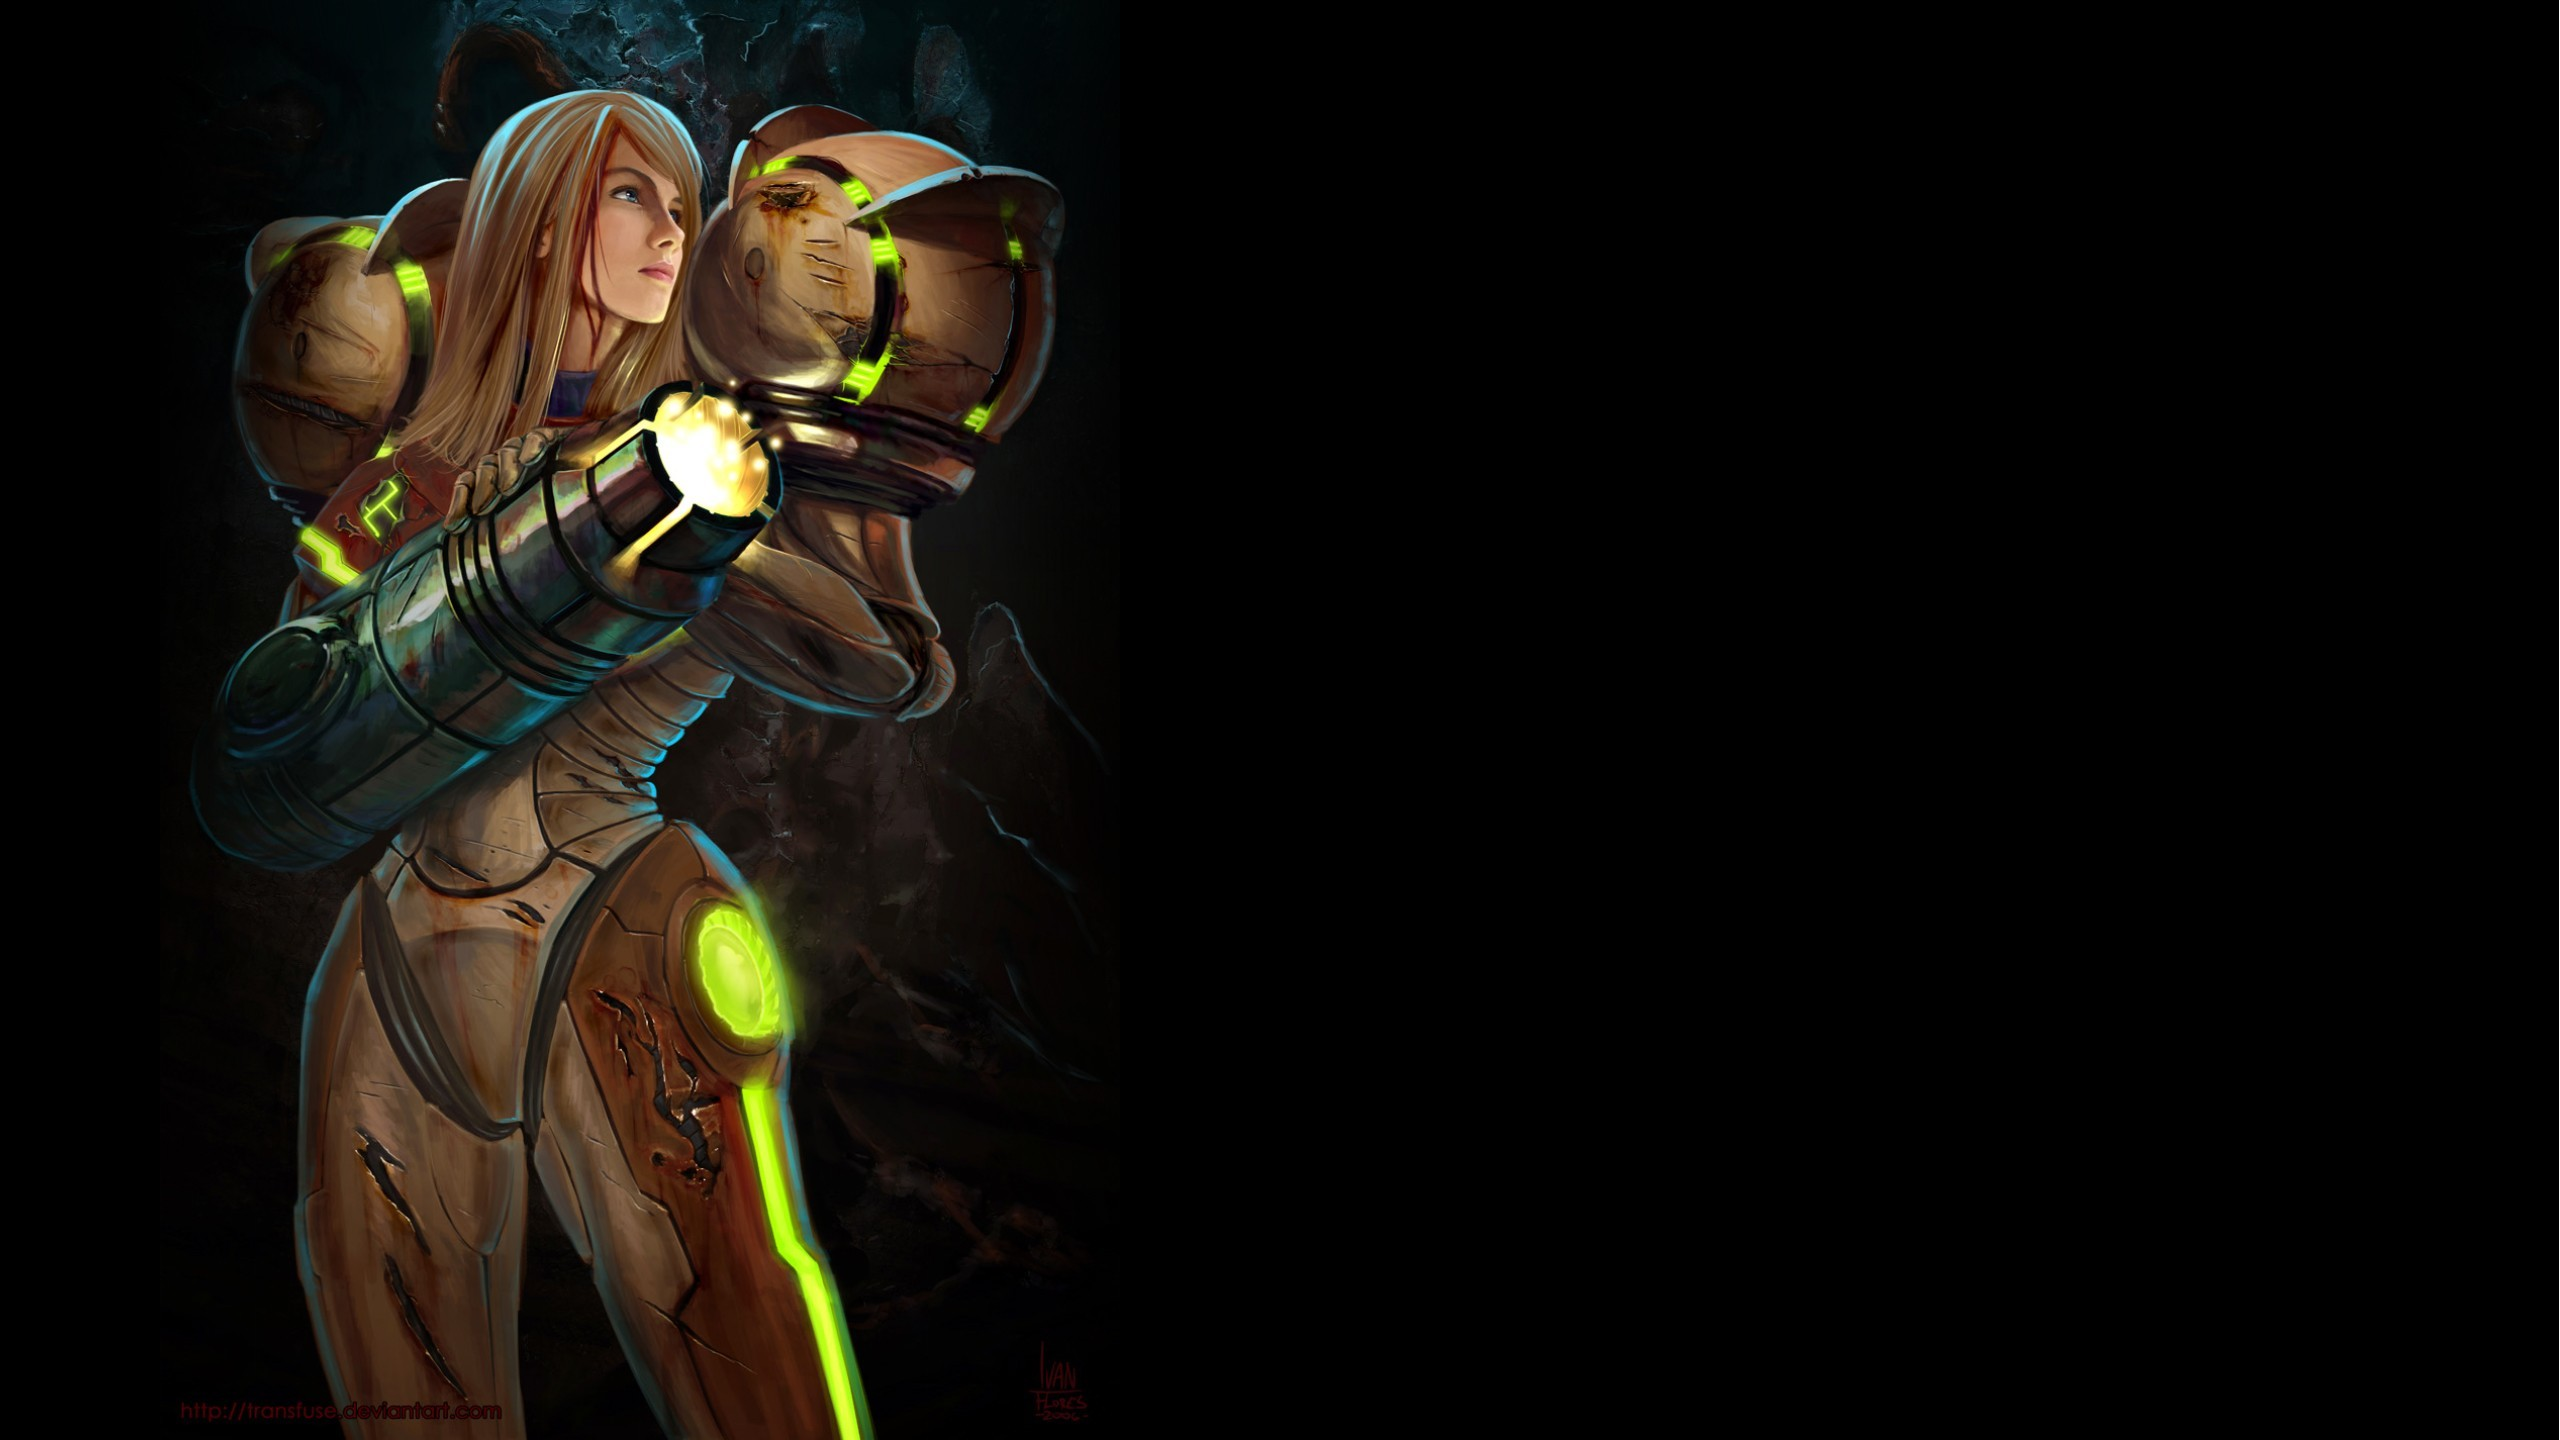 digit Metroid samus aran video games HD Wallpaper